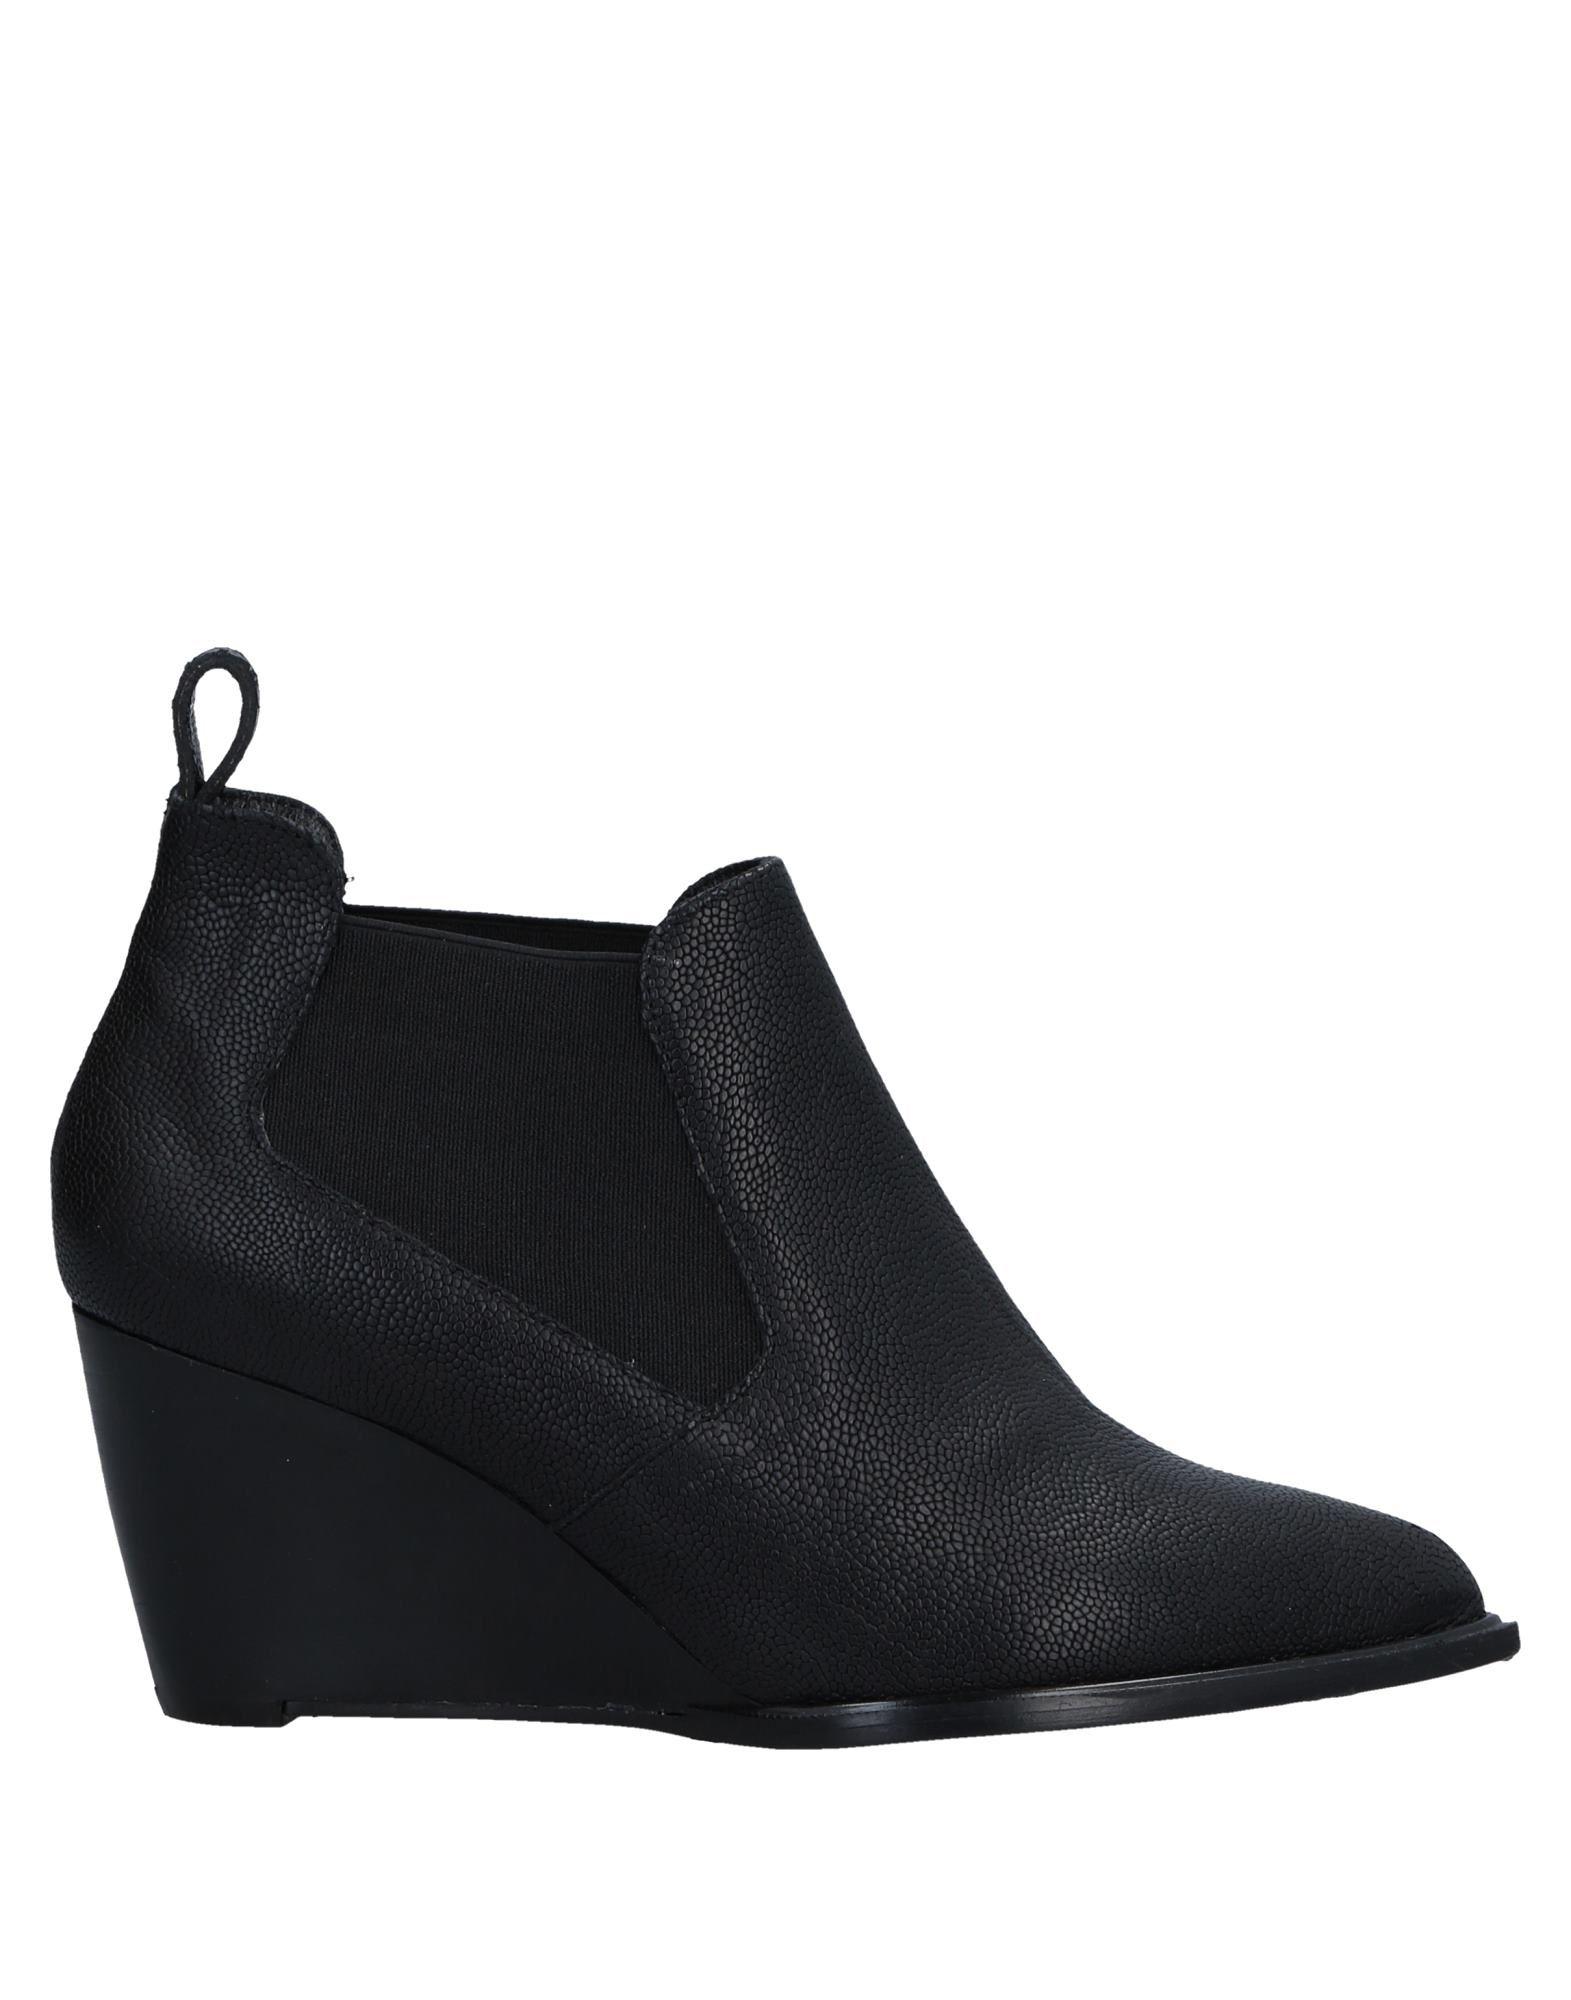 Rabatt Schuhe Robert Clergerie Stiefelette Damen  11533827AI